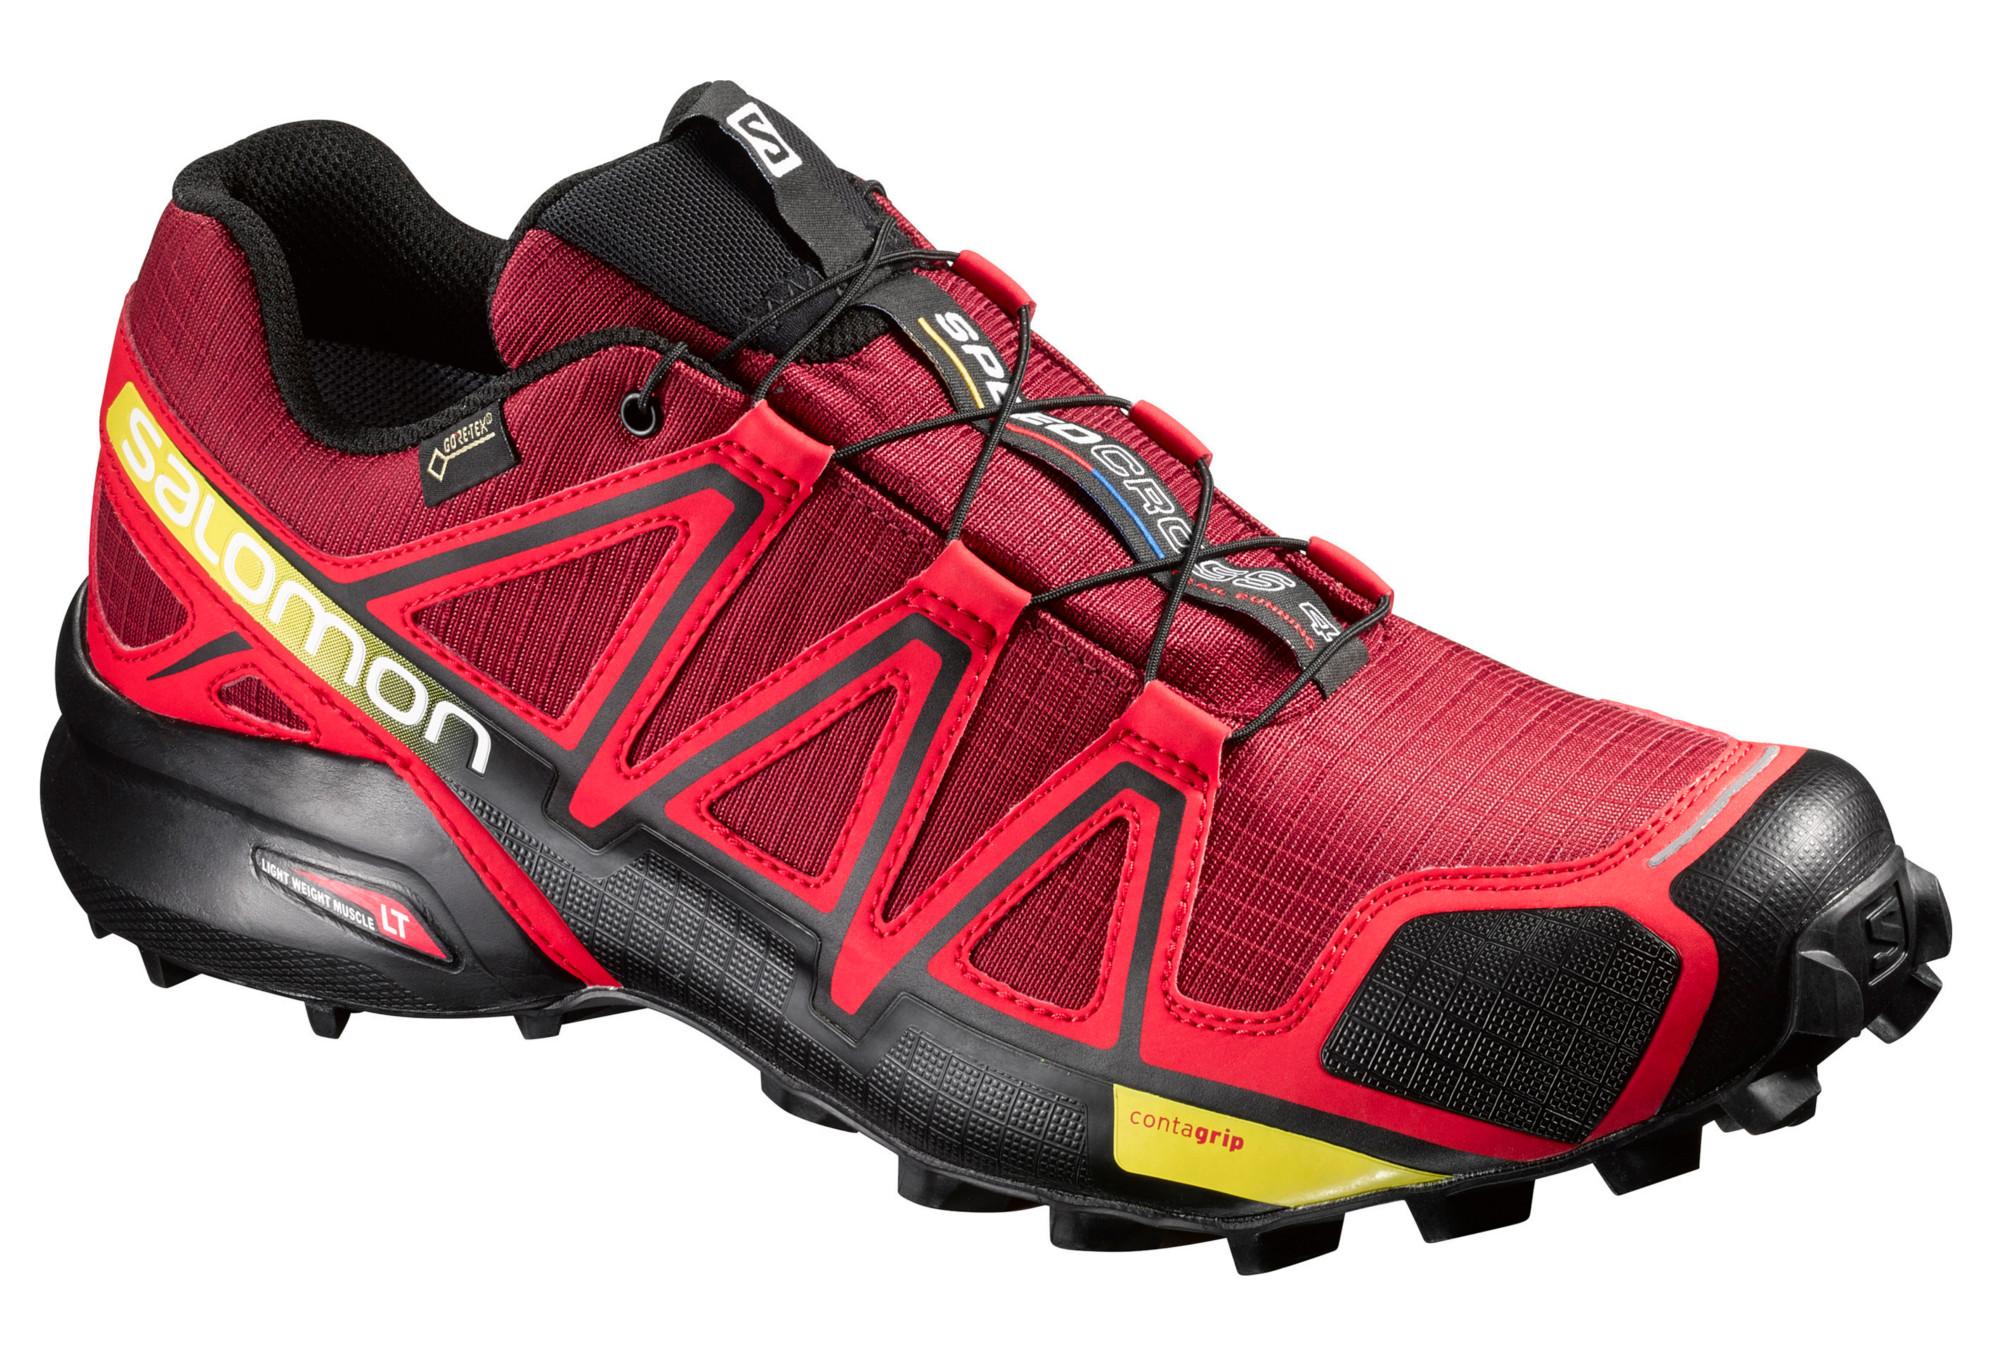 Rouge Chaussures Salomon Trail Speedcross De 4 Gtx Pp4pqYrU